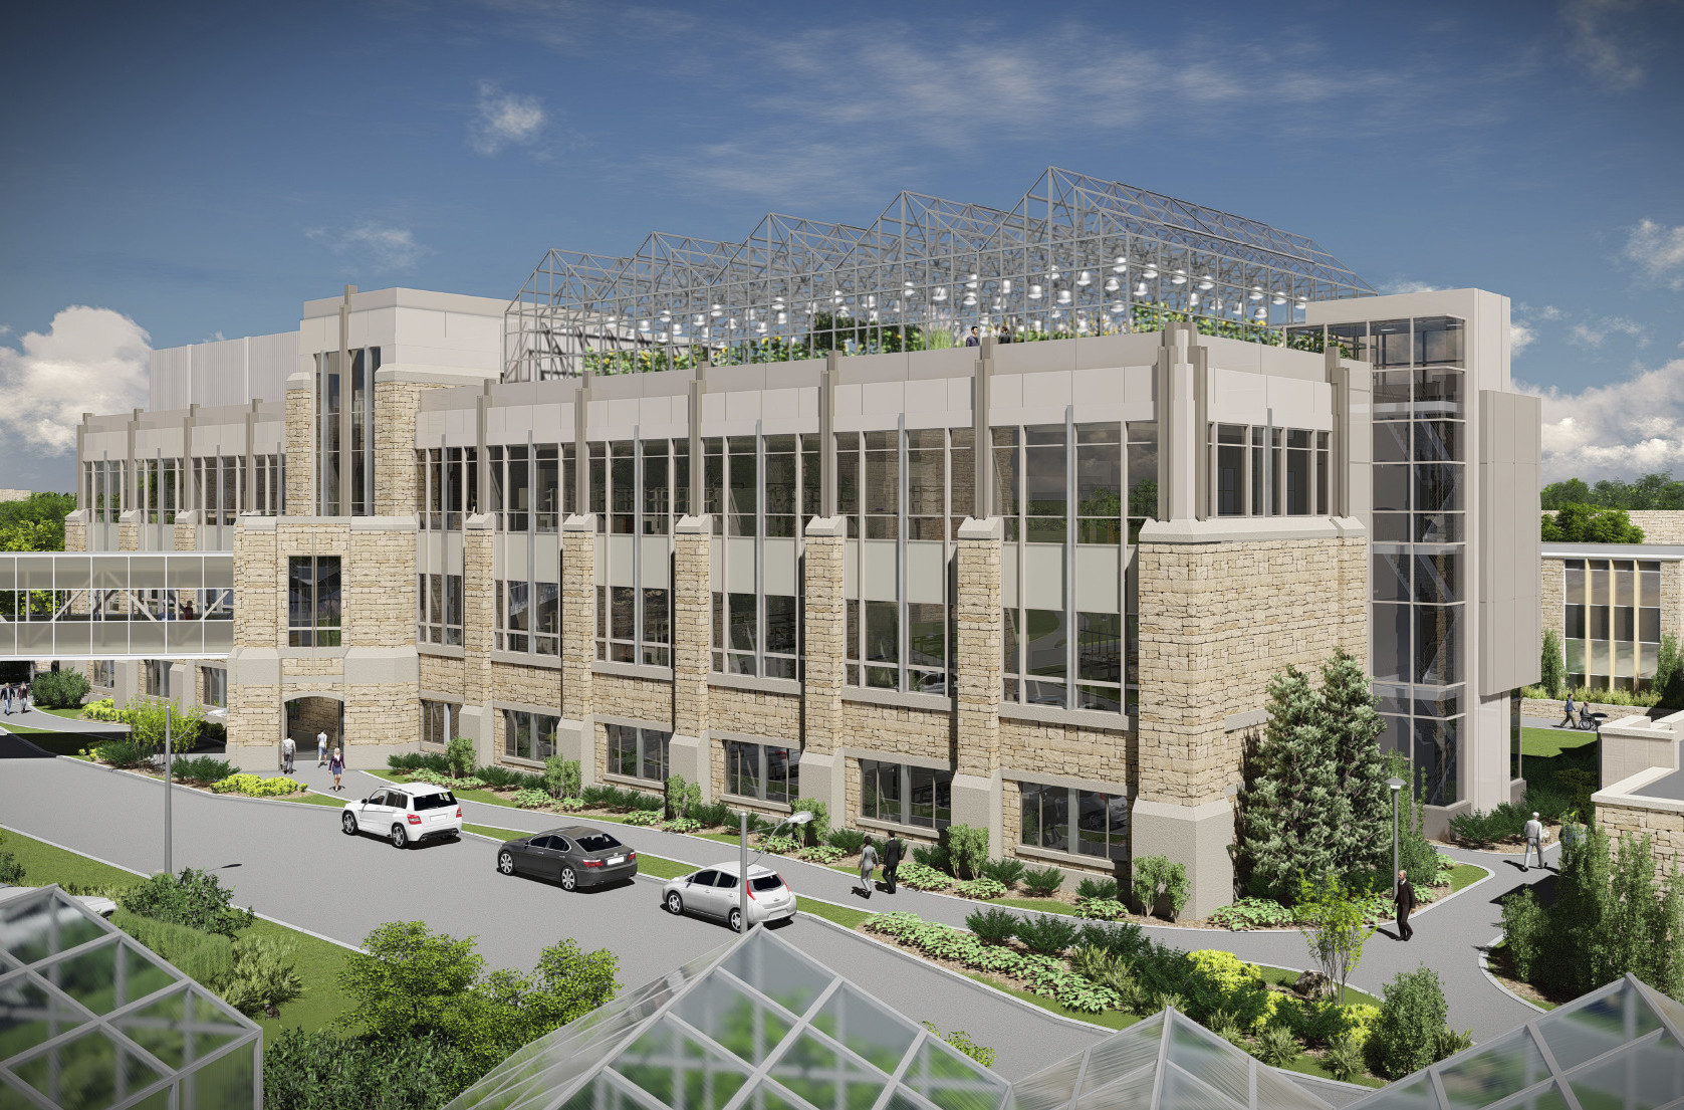 University of Saskatchewan - Collaborative Sciences Research Building